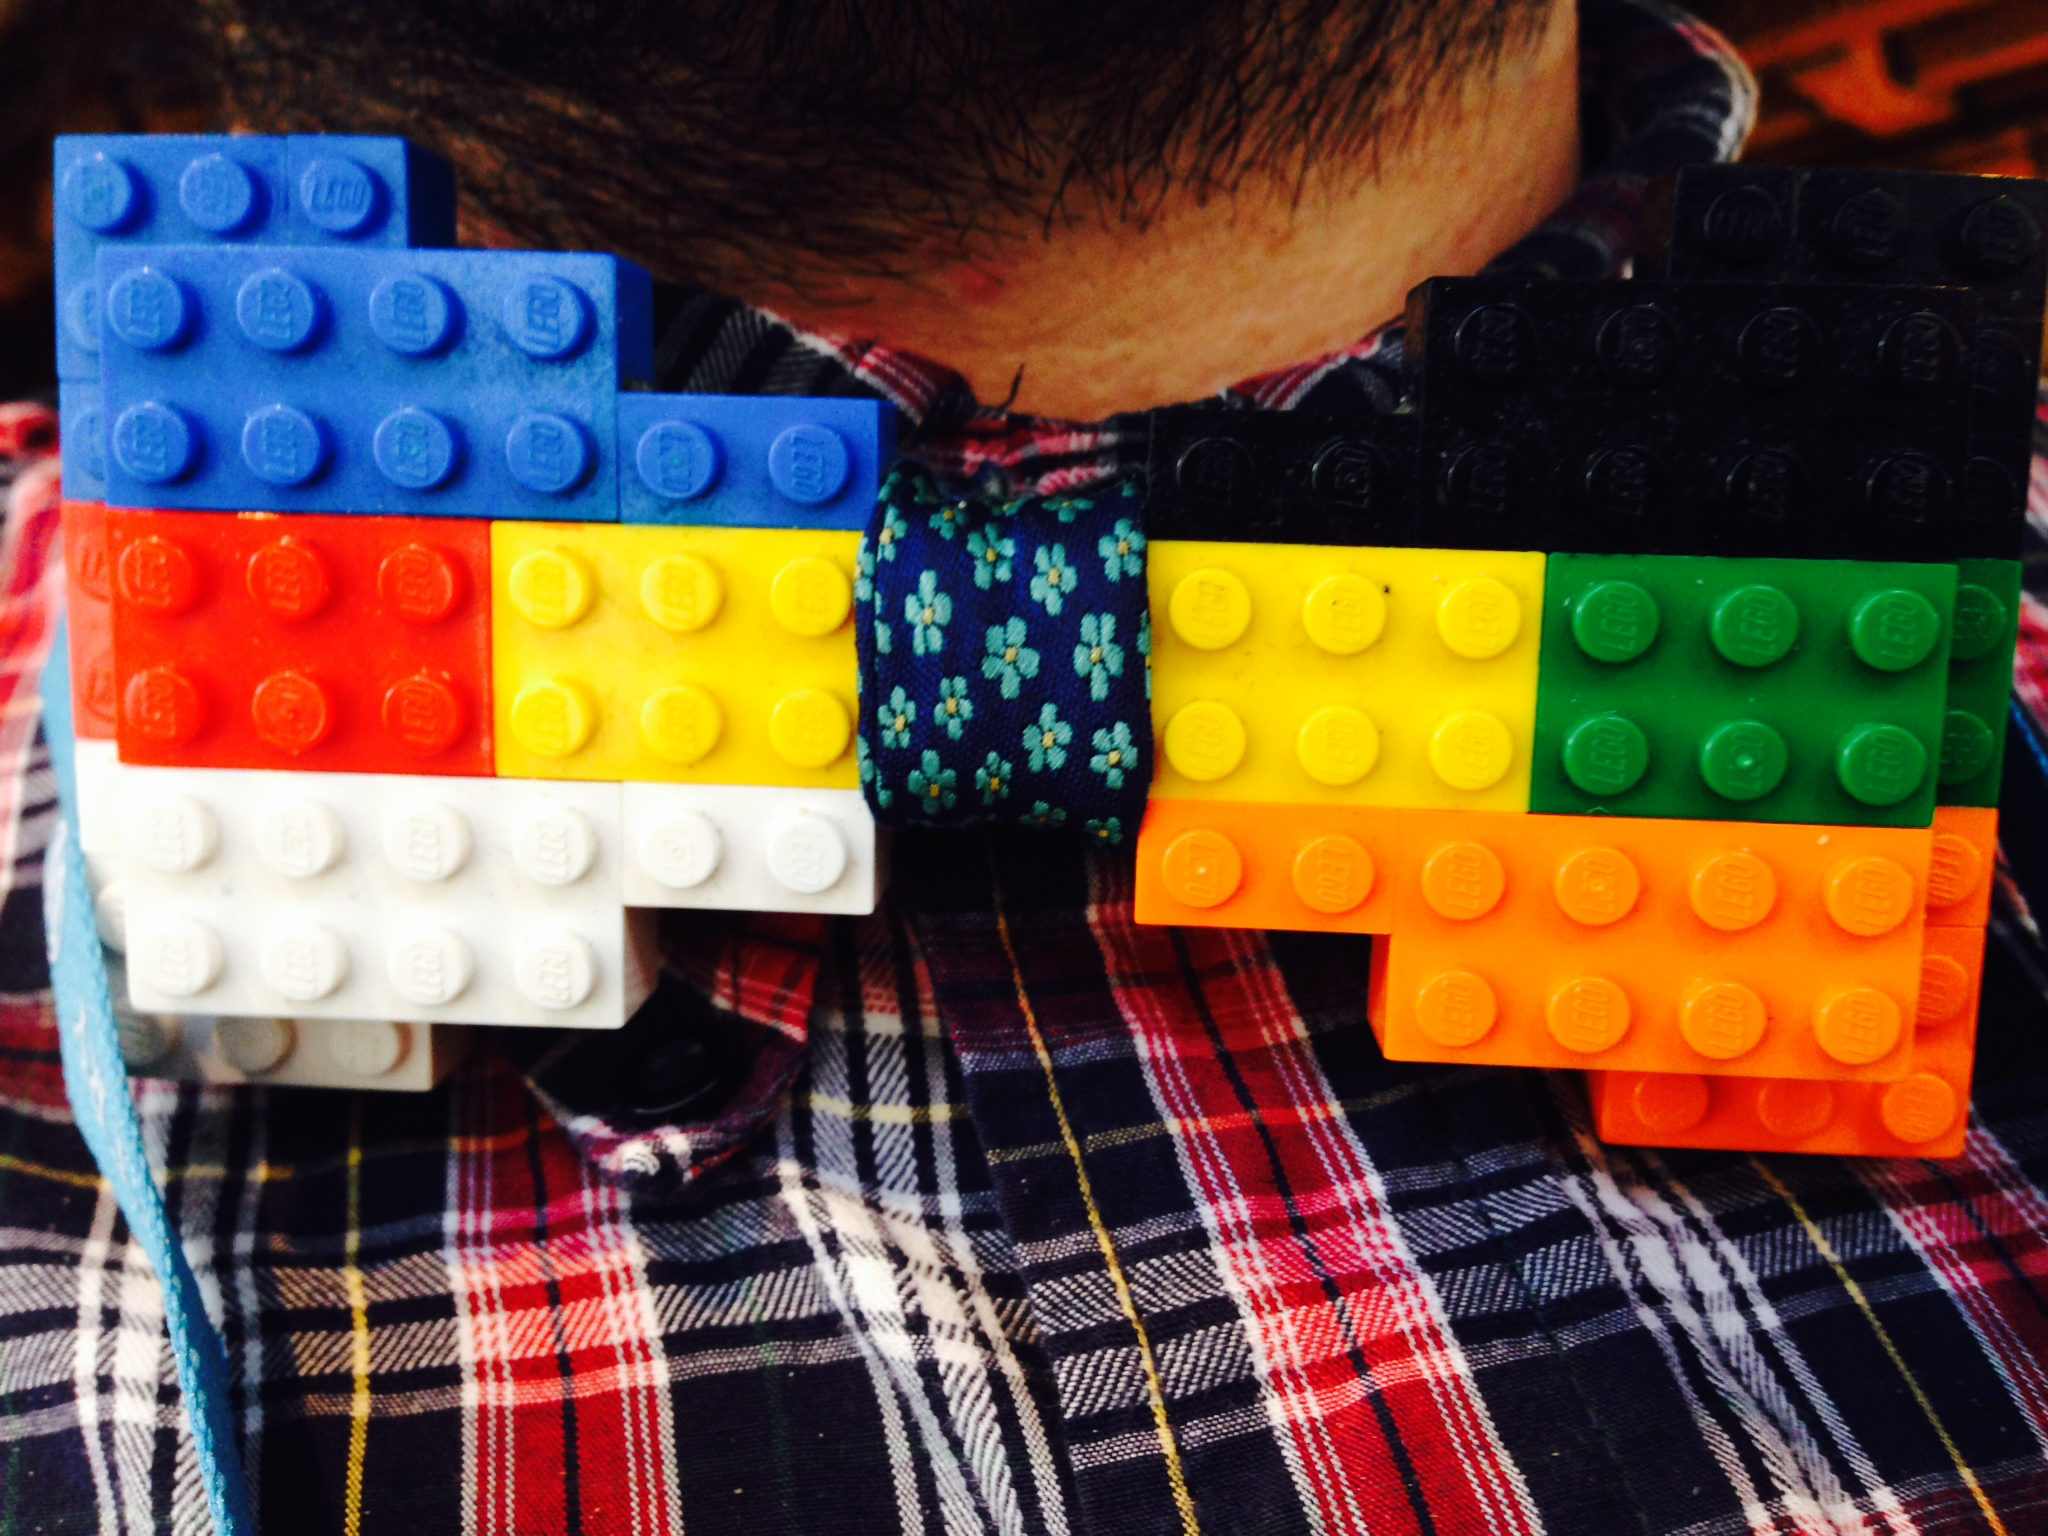 Aaron Jorbin and his Lego Bowtie at WordCamp Seattle